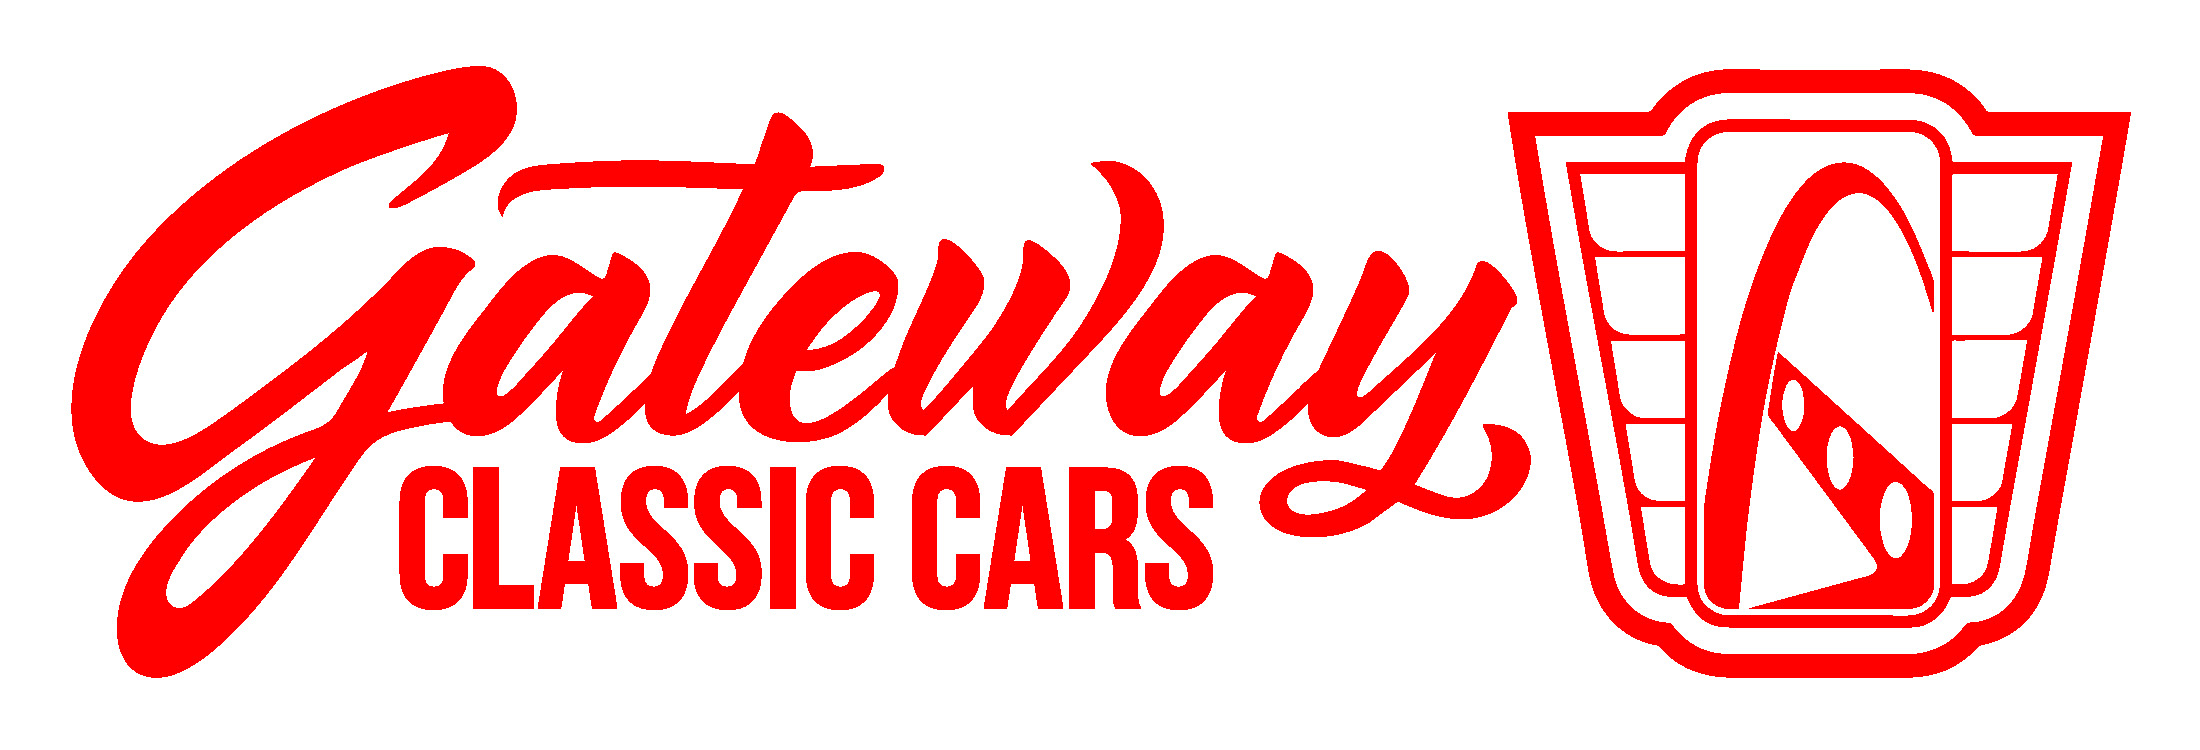 Sponsor Gateway Classic Cars